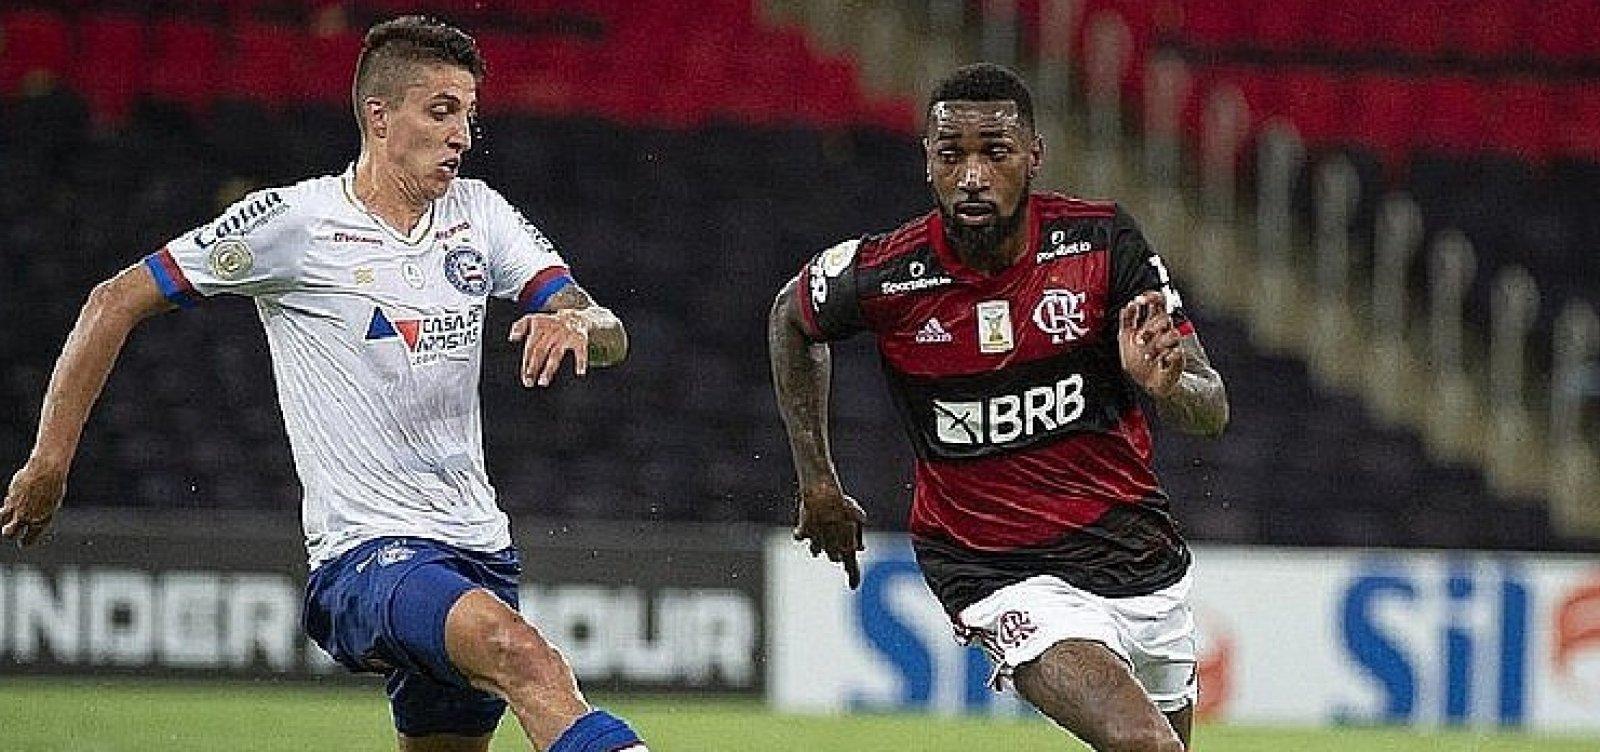 Bahia defende Ramirez após indiciamento por racismo